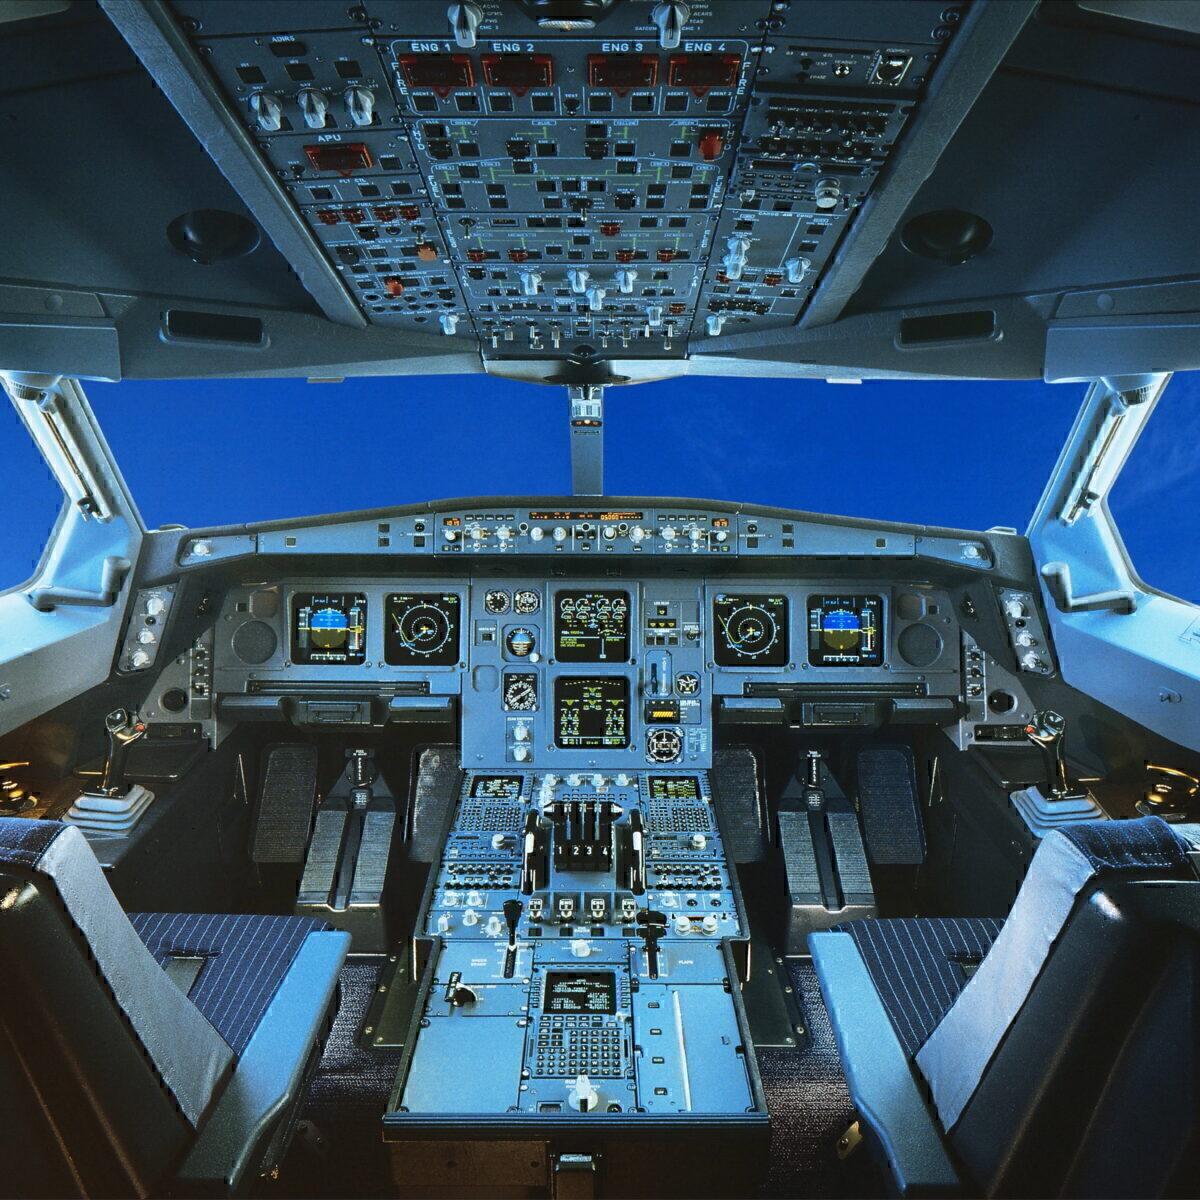 Airbus A340 cockpit